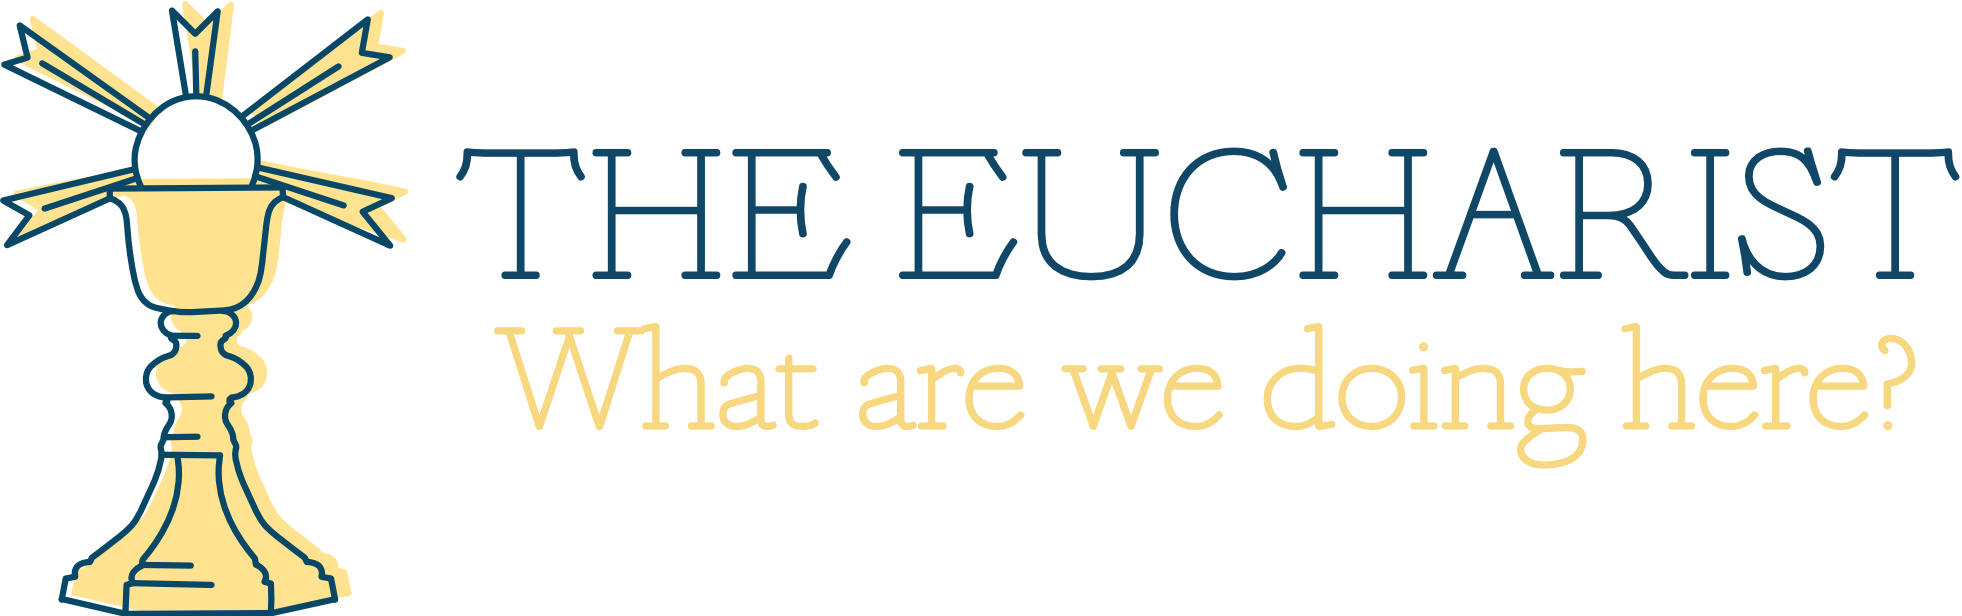 The Eucharist Adult Forum.jpg